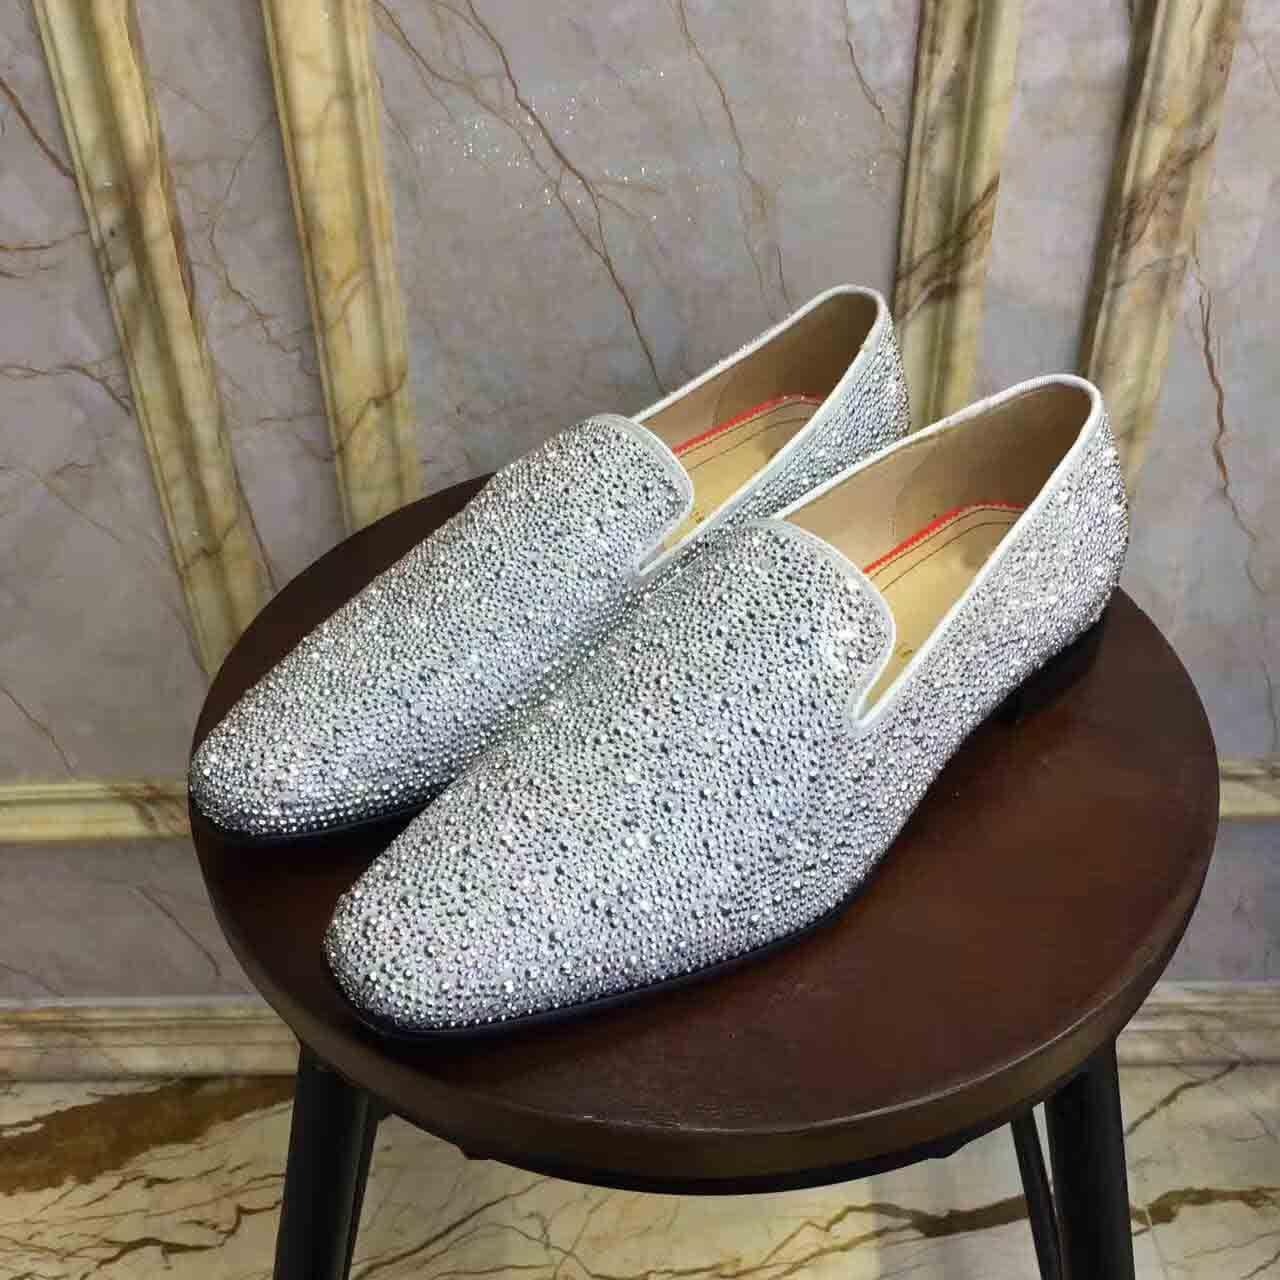 Mode Goujons Red Bottom Mocassins Hommes Flats Avec bling strass diamants Glitter Slipper chaussures robe de mariée noire en cuir véritable avec la boîte